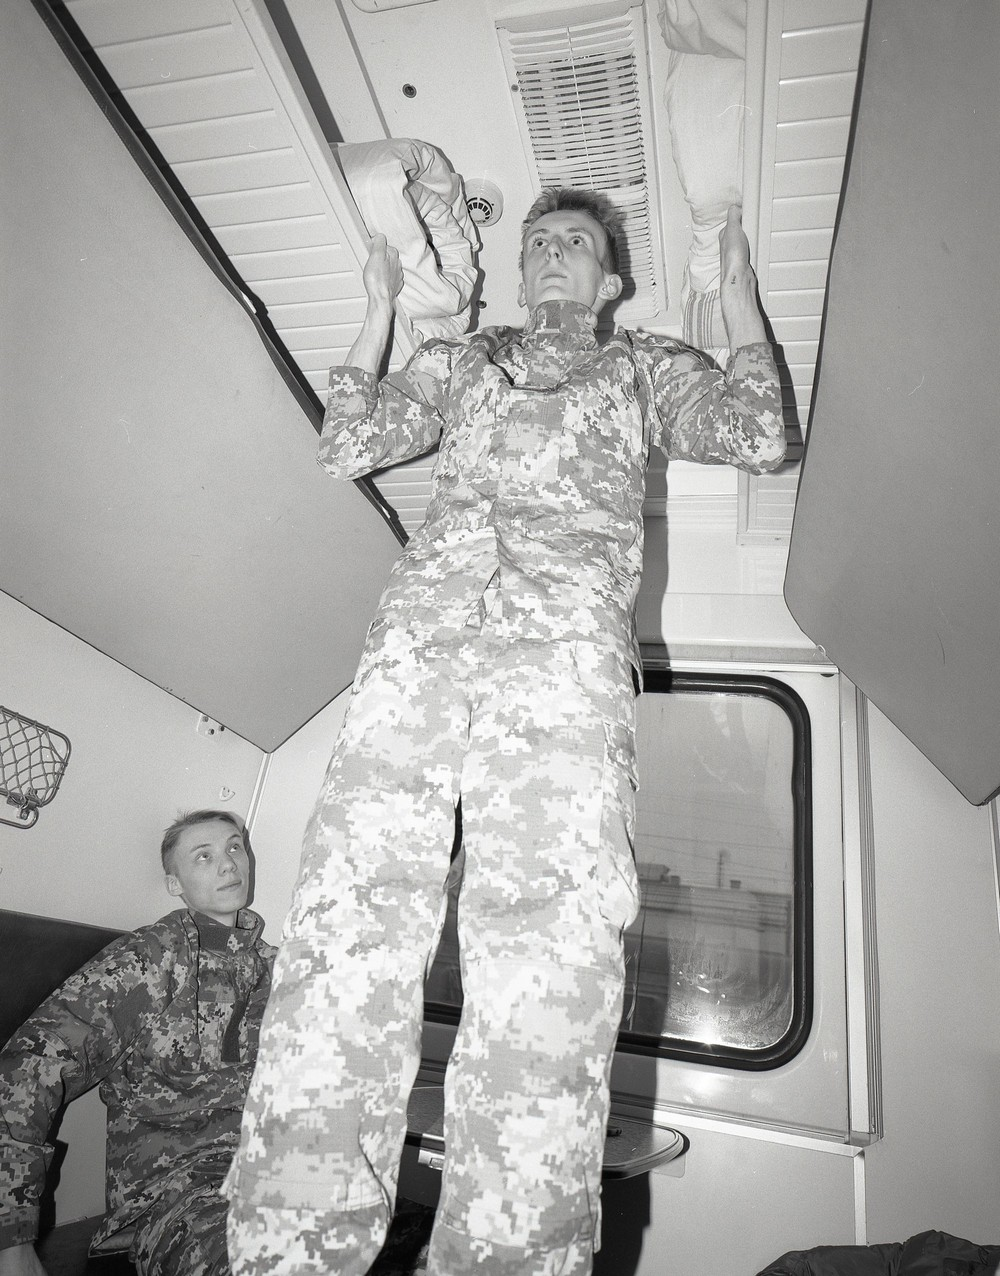 Вагончик тронулся: фэшн-съемка в поезде (30 фото)